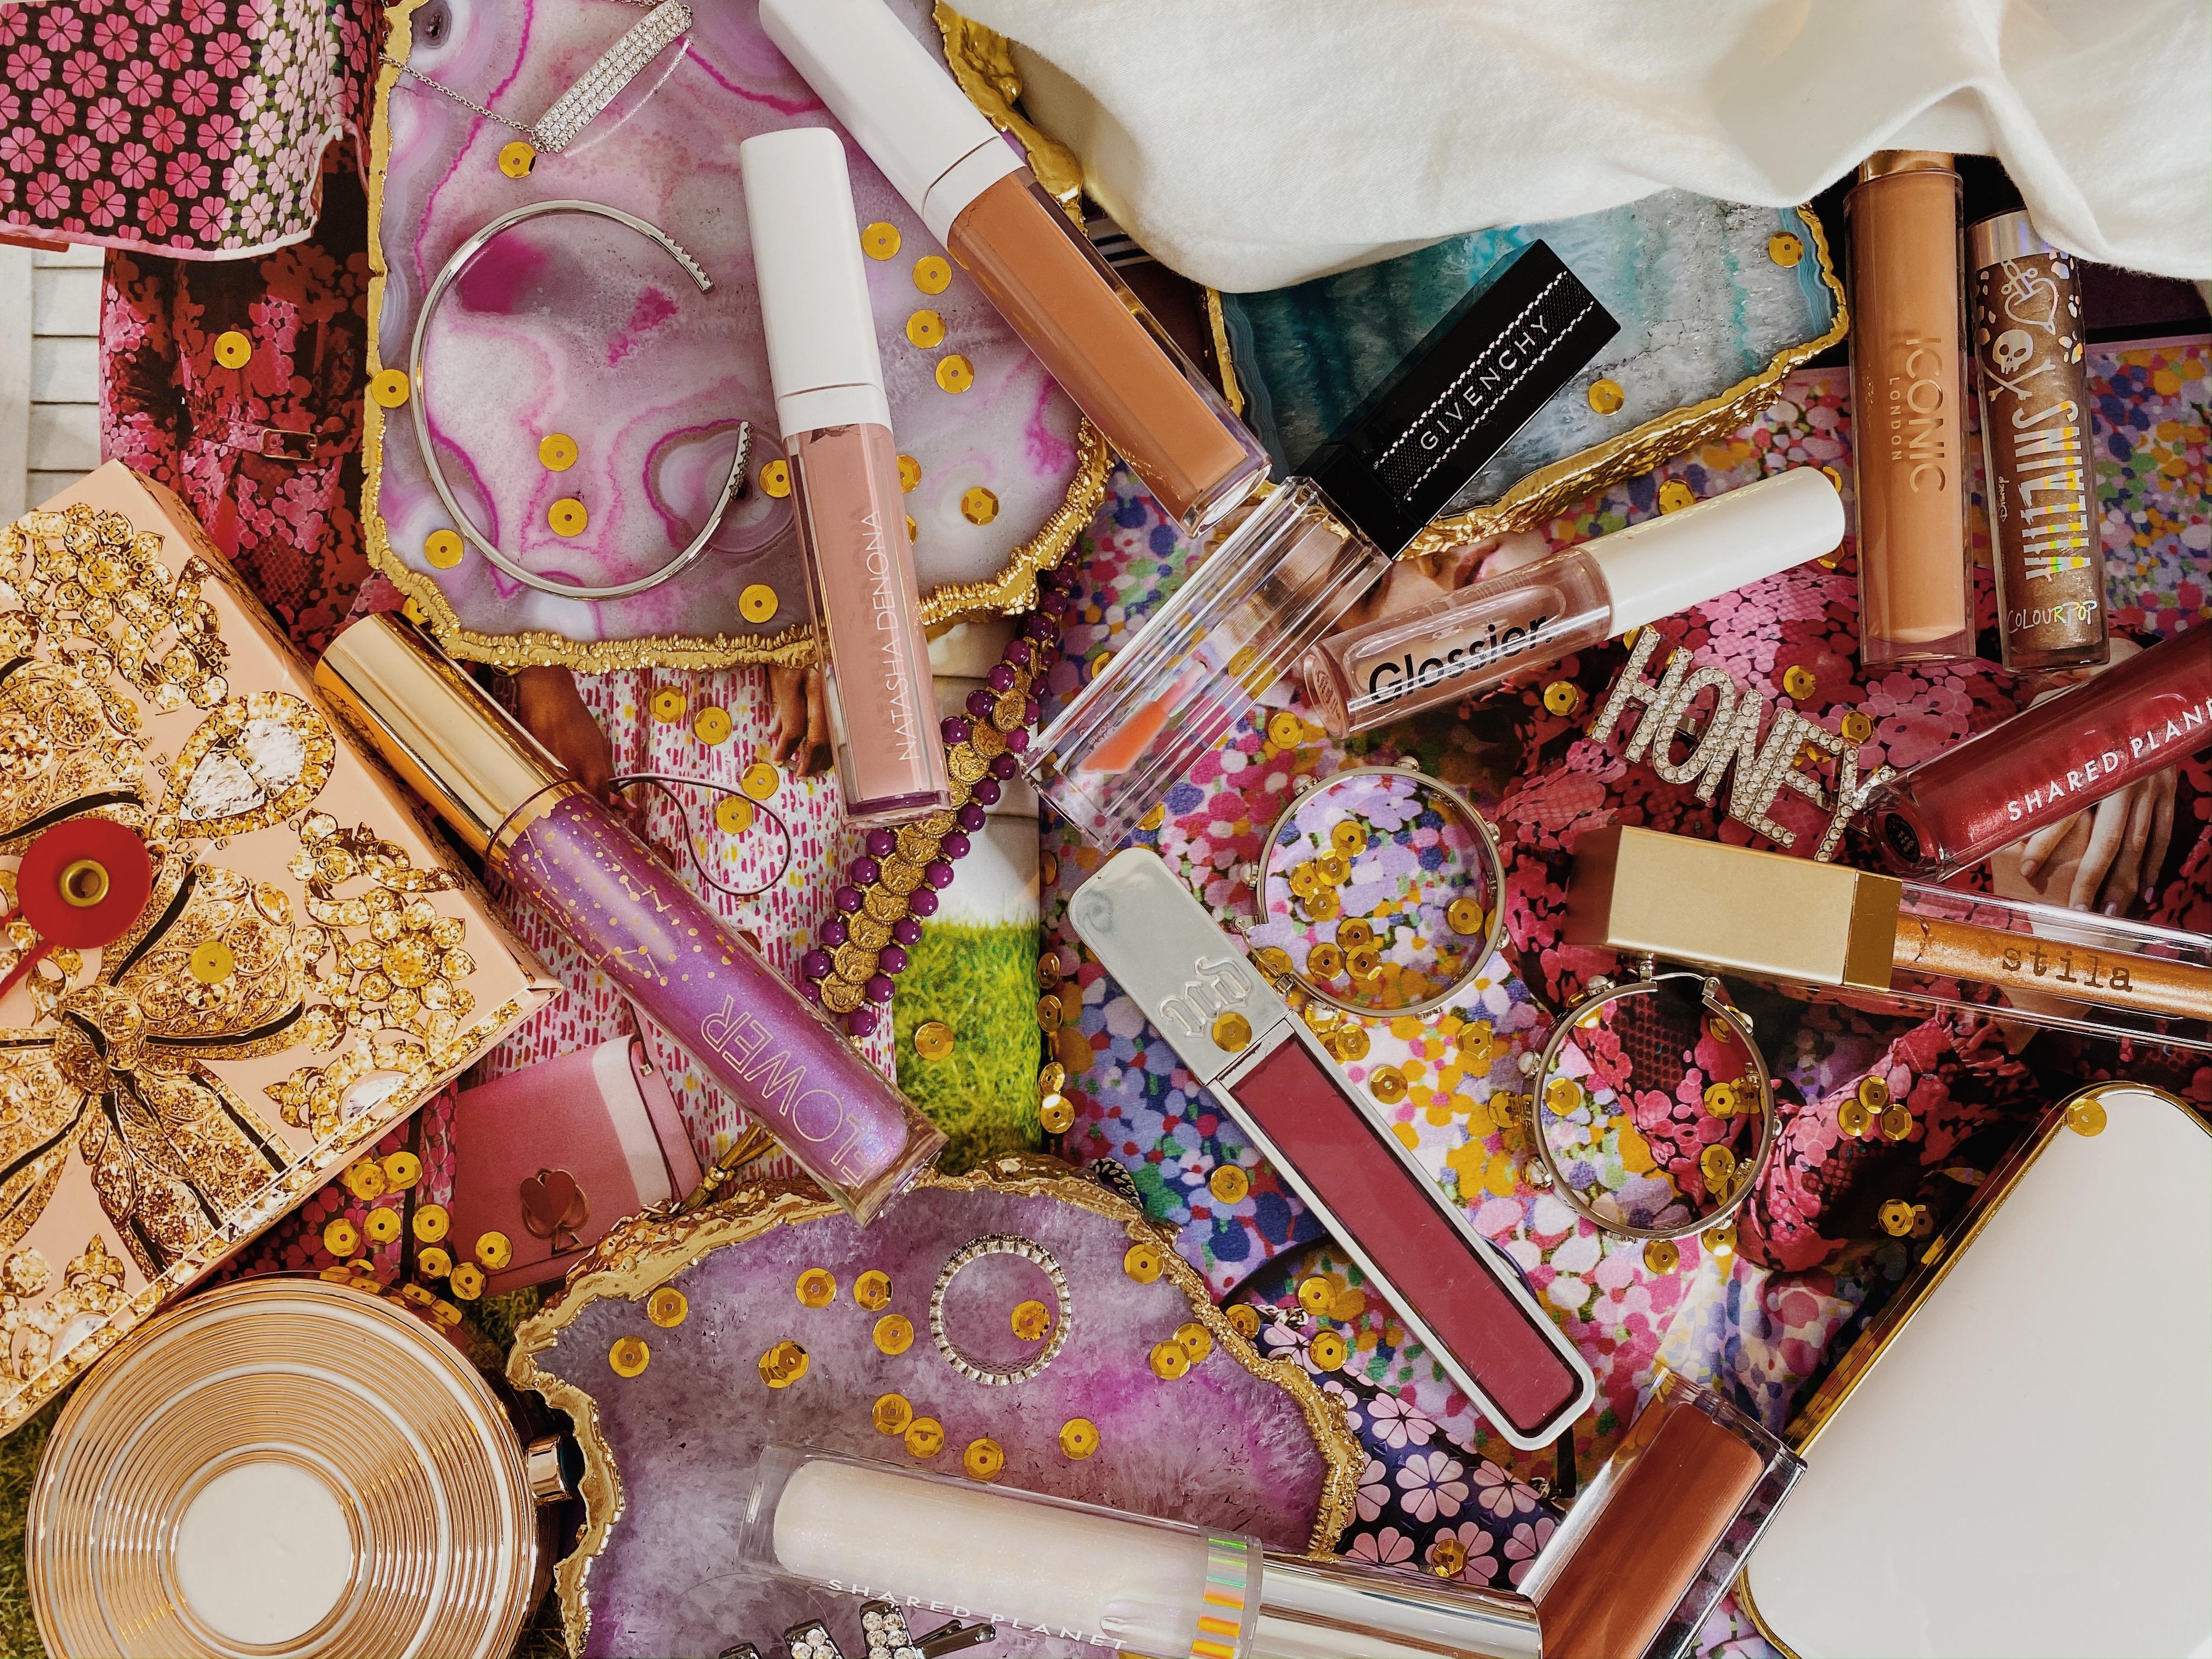 Lip Gloss Collection Ranking | Natasha Denona Lip Glaze | Stila Boss Gloss | Flower Beauty Gloss | Iconic London Lip Plumping Gloss | ColourPop x Disney Villains Ultra Glossy Lip | Glossier Clear Gloss | Urban Decay Hi-Fi Shine Lip Gloss | Shared Planet Polar Bear Lip Glosses | Givenchy Lip Vinyl Gloss